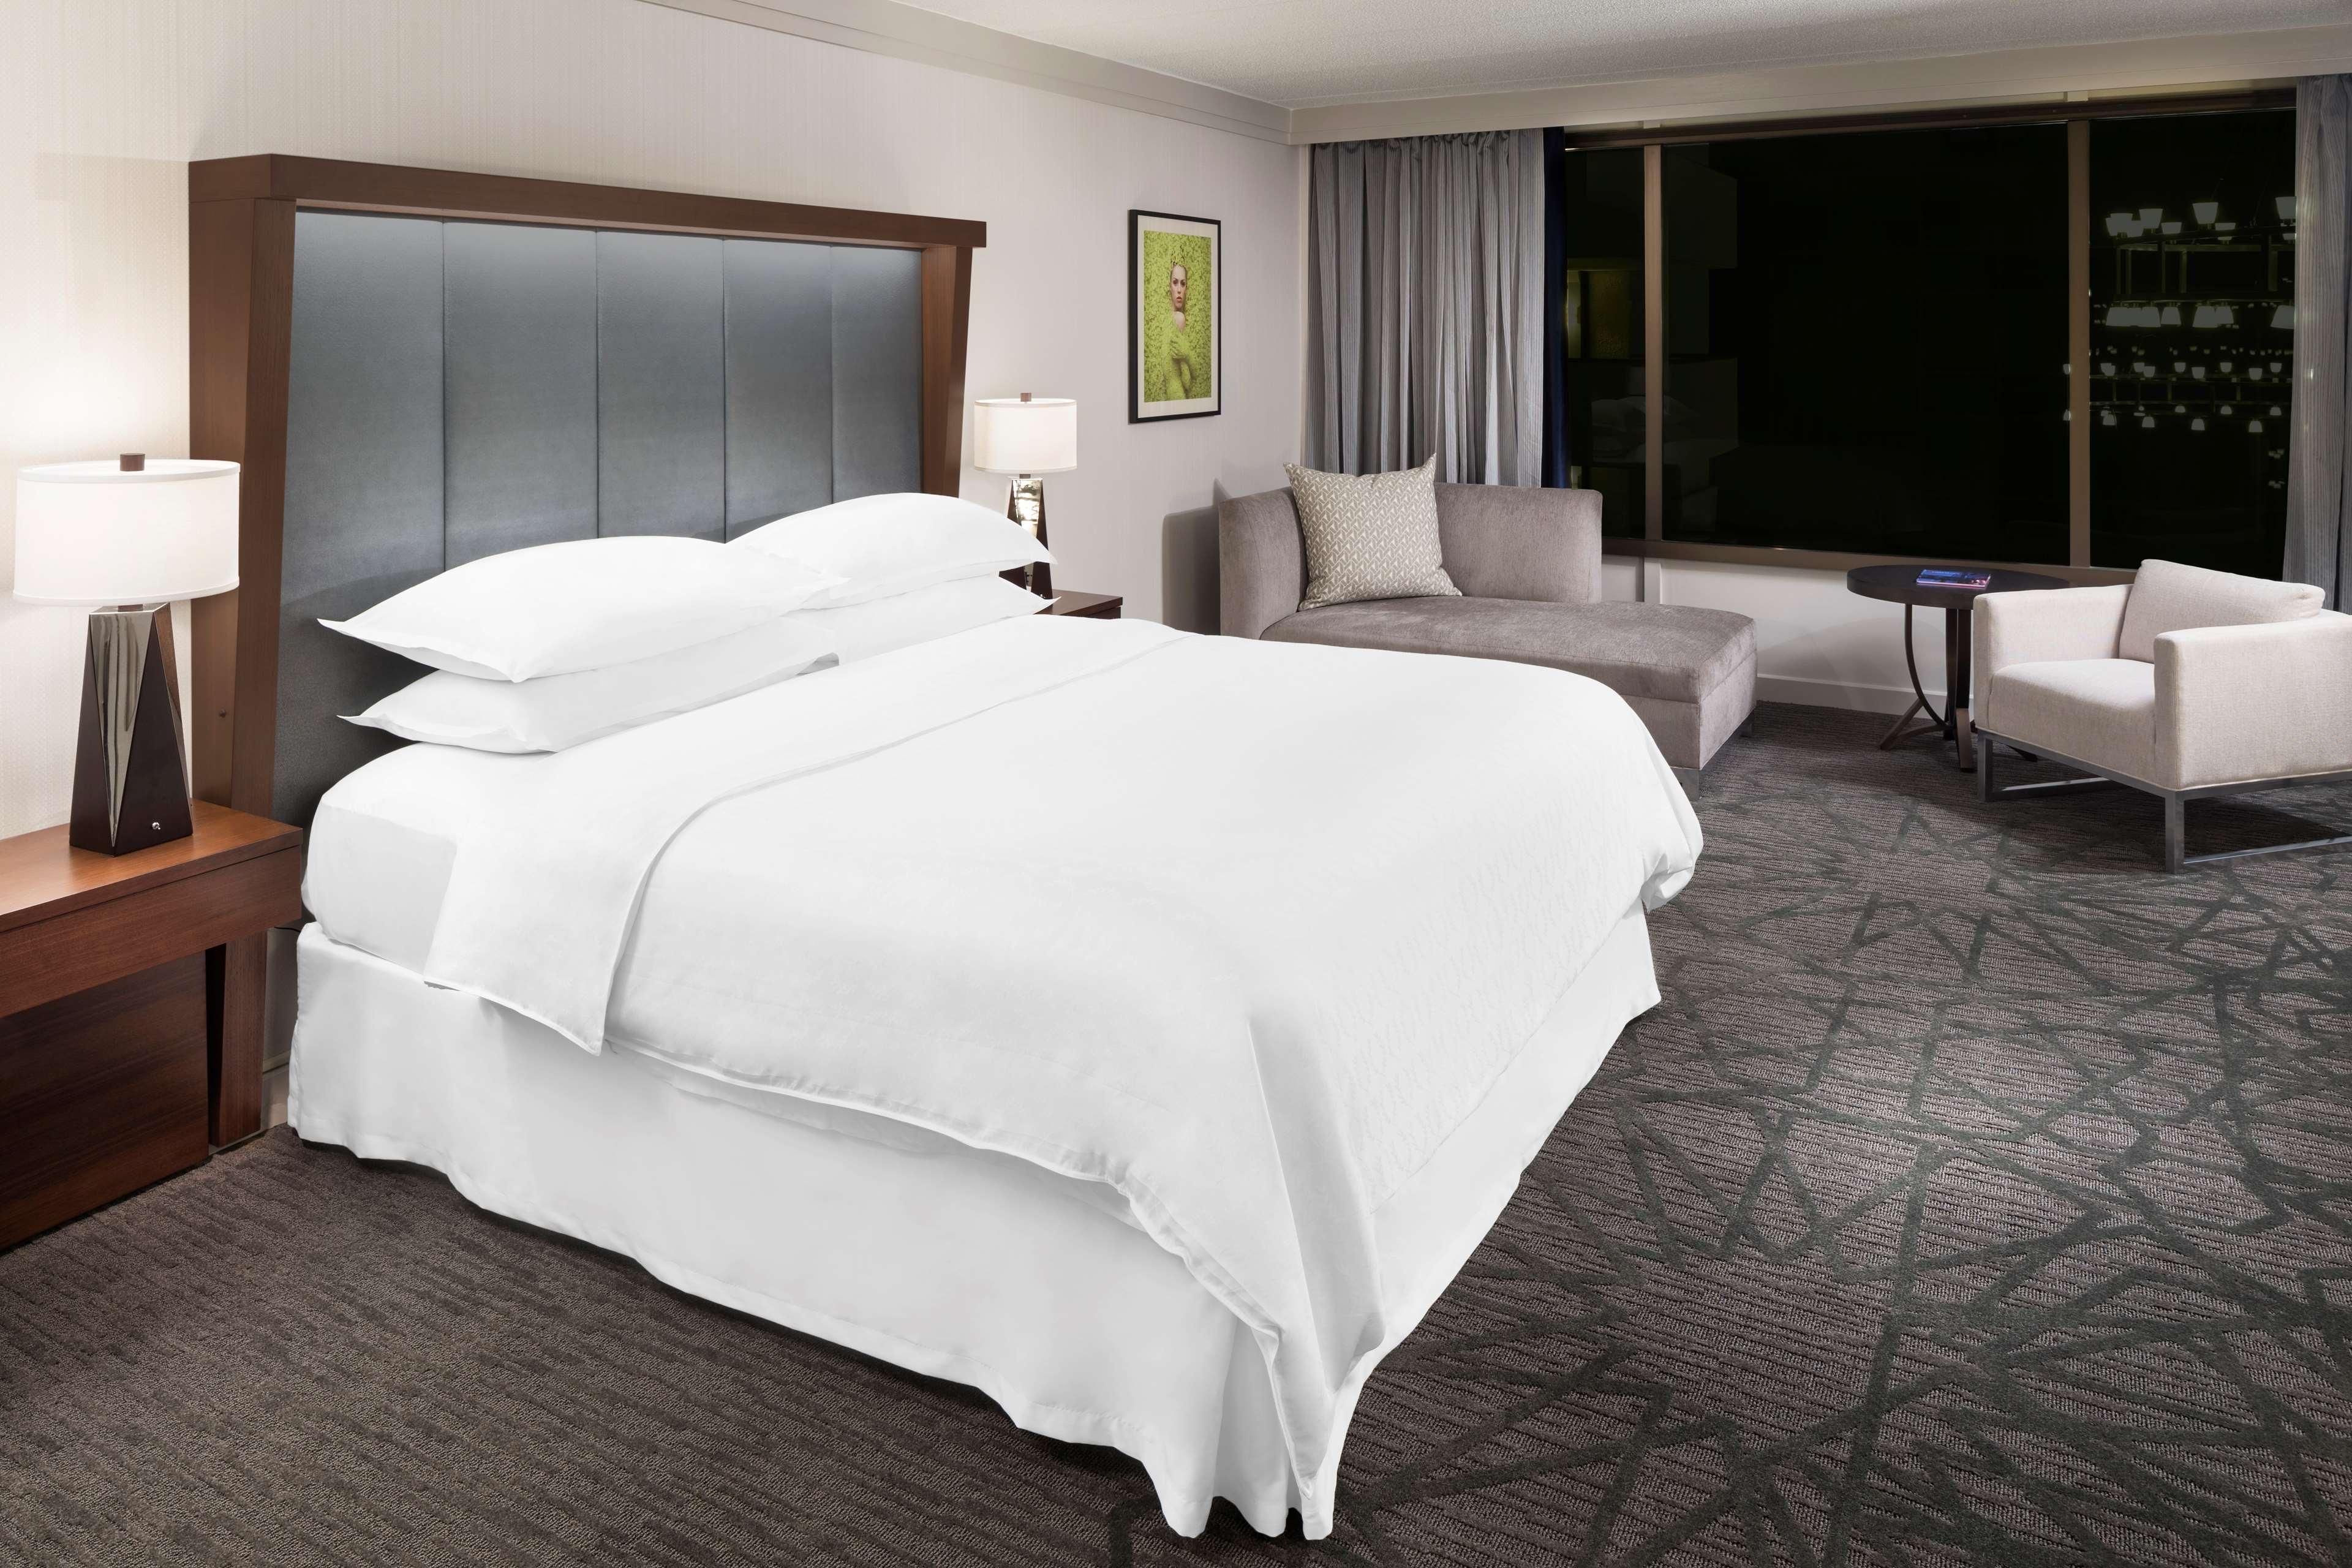 Sheraton Bloomington Hotel image 3